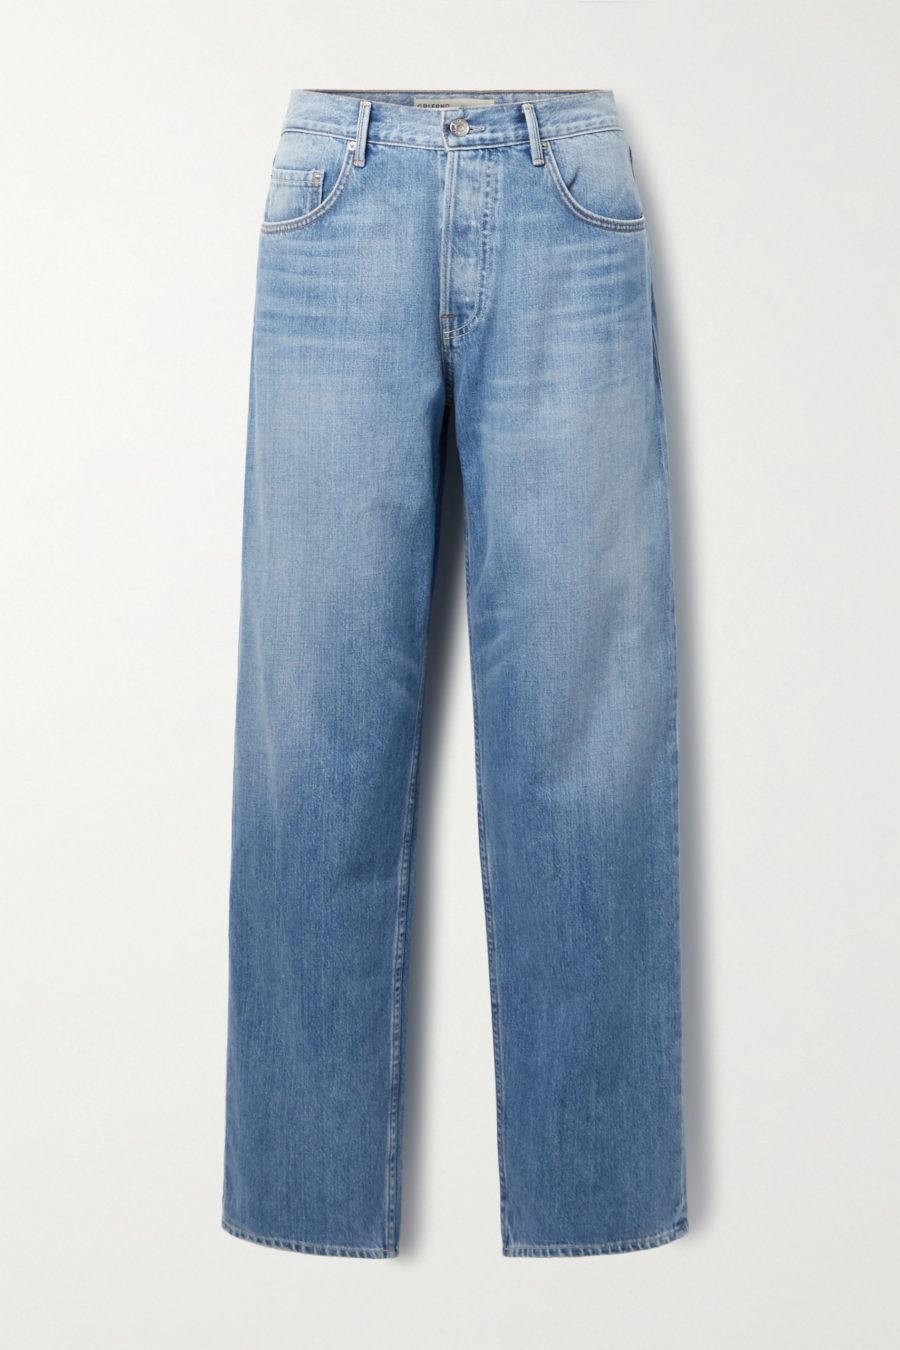 Grlfrnd Bella Low-Rise Straight-Leg Jeans ($225)